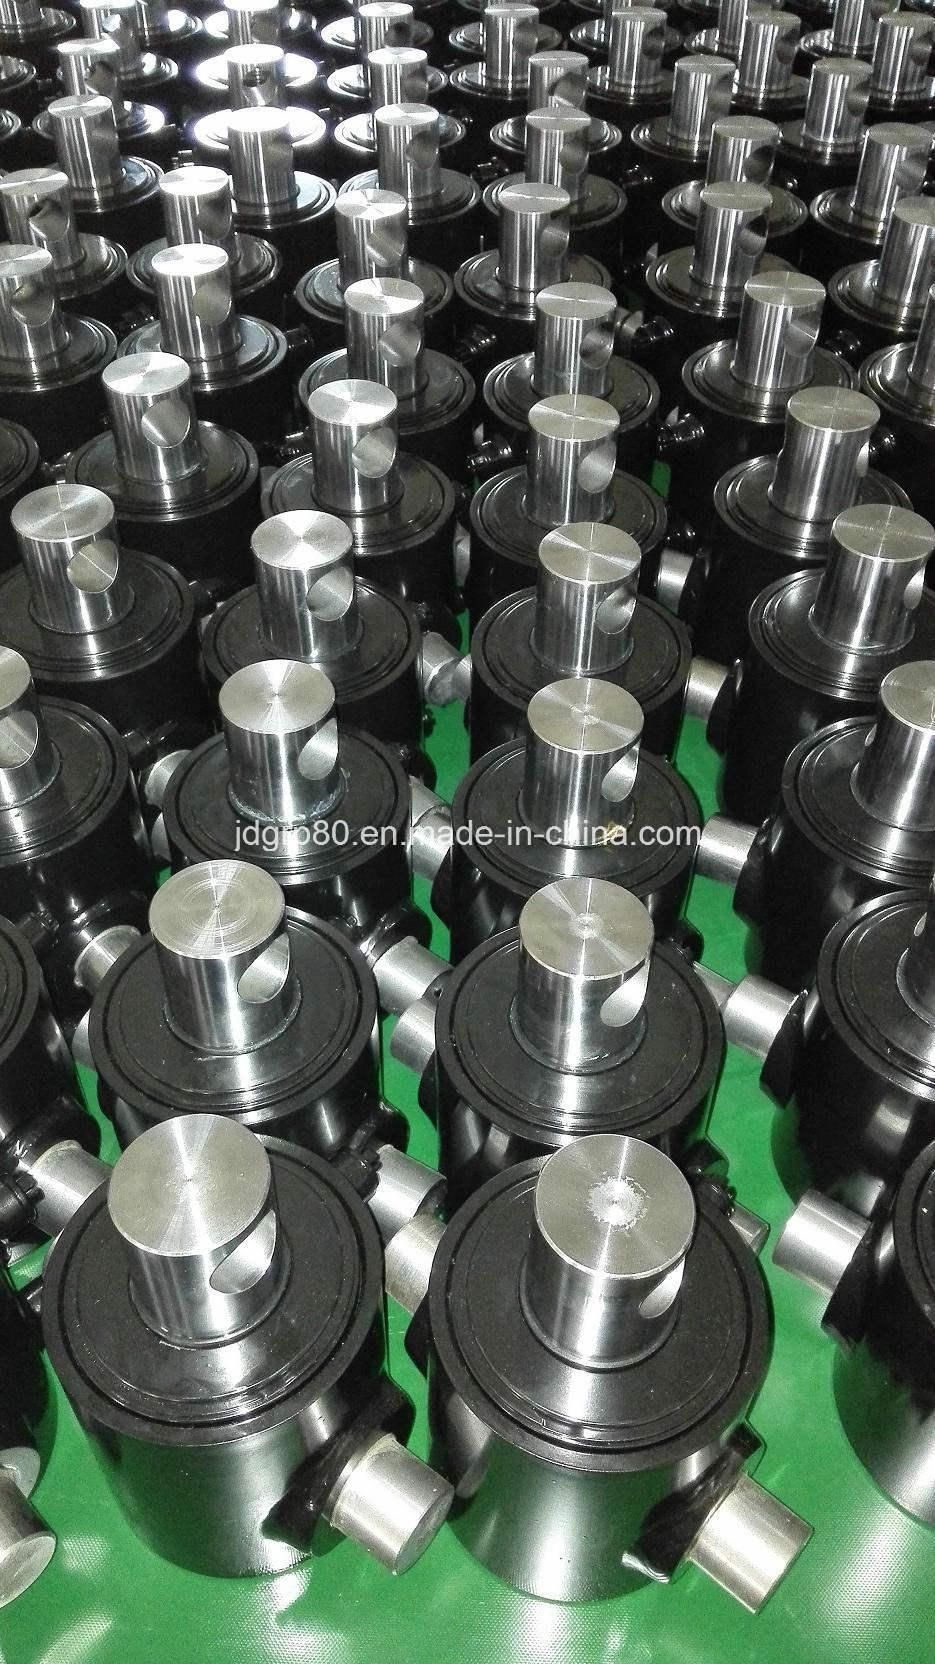 Hydraulic Cylinder for USA Market Custom-Made